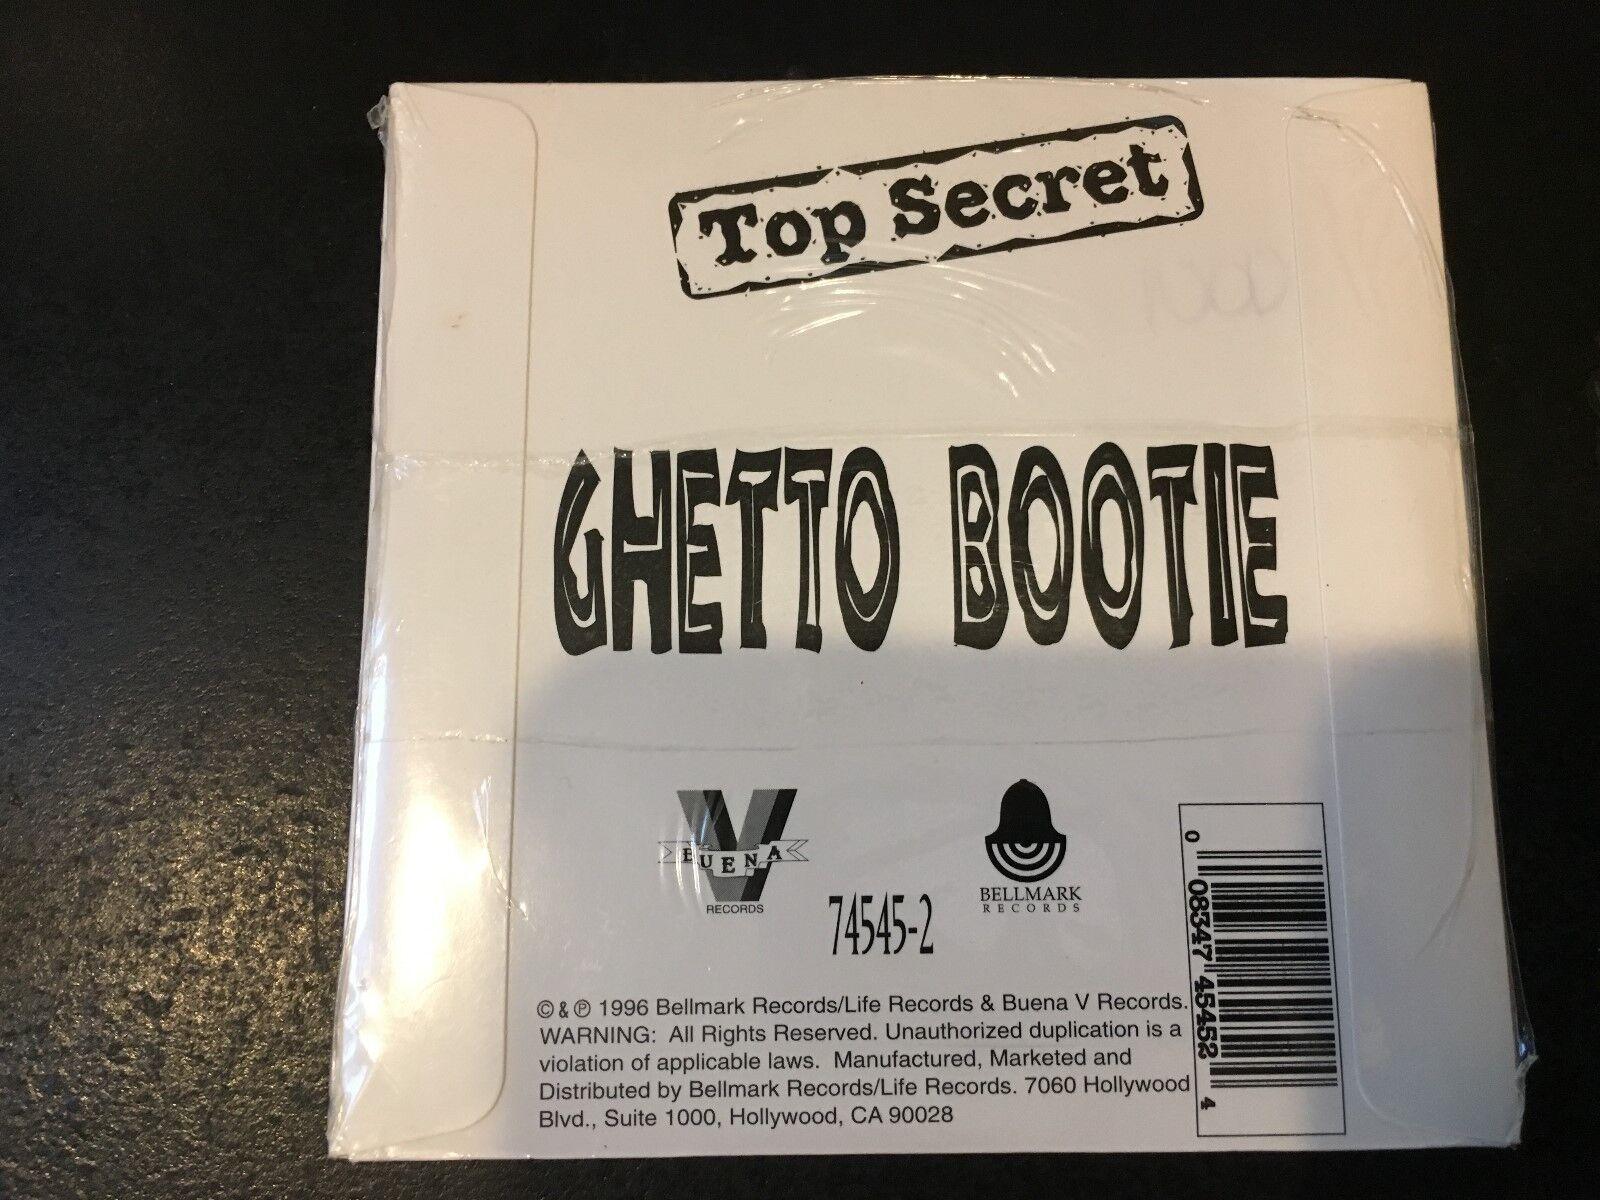 Ghettobootie